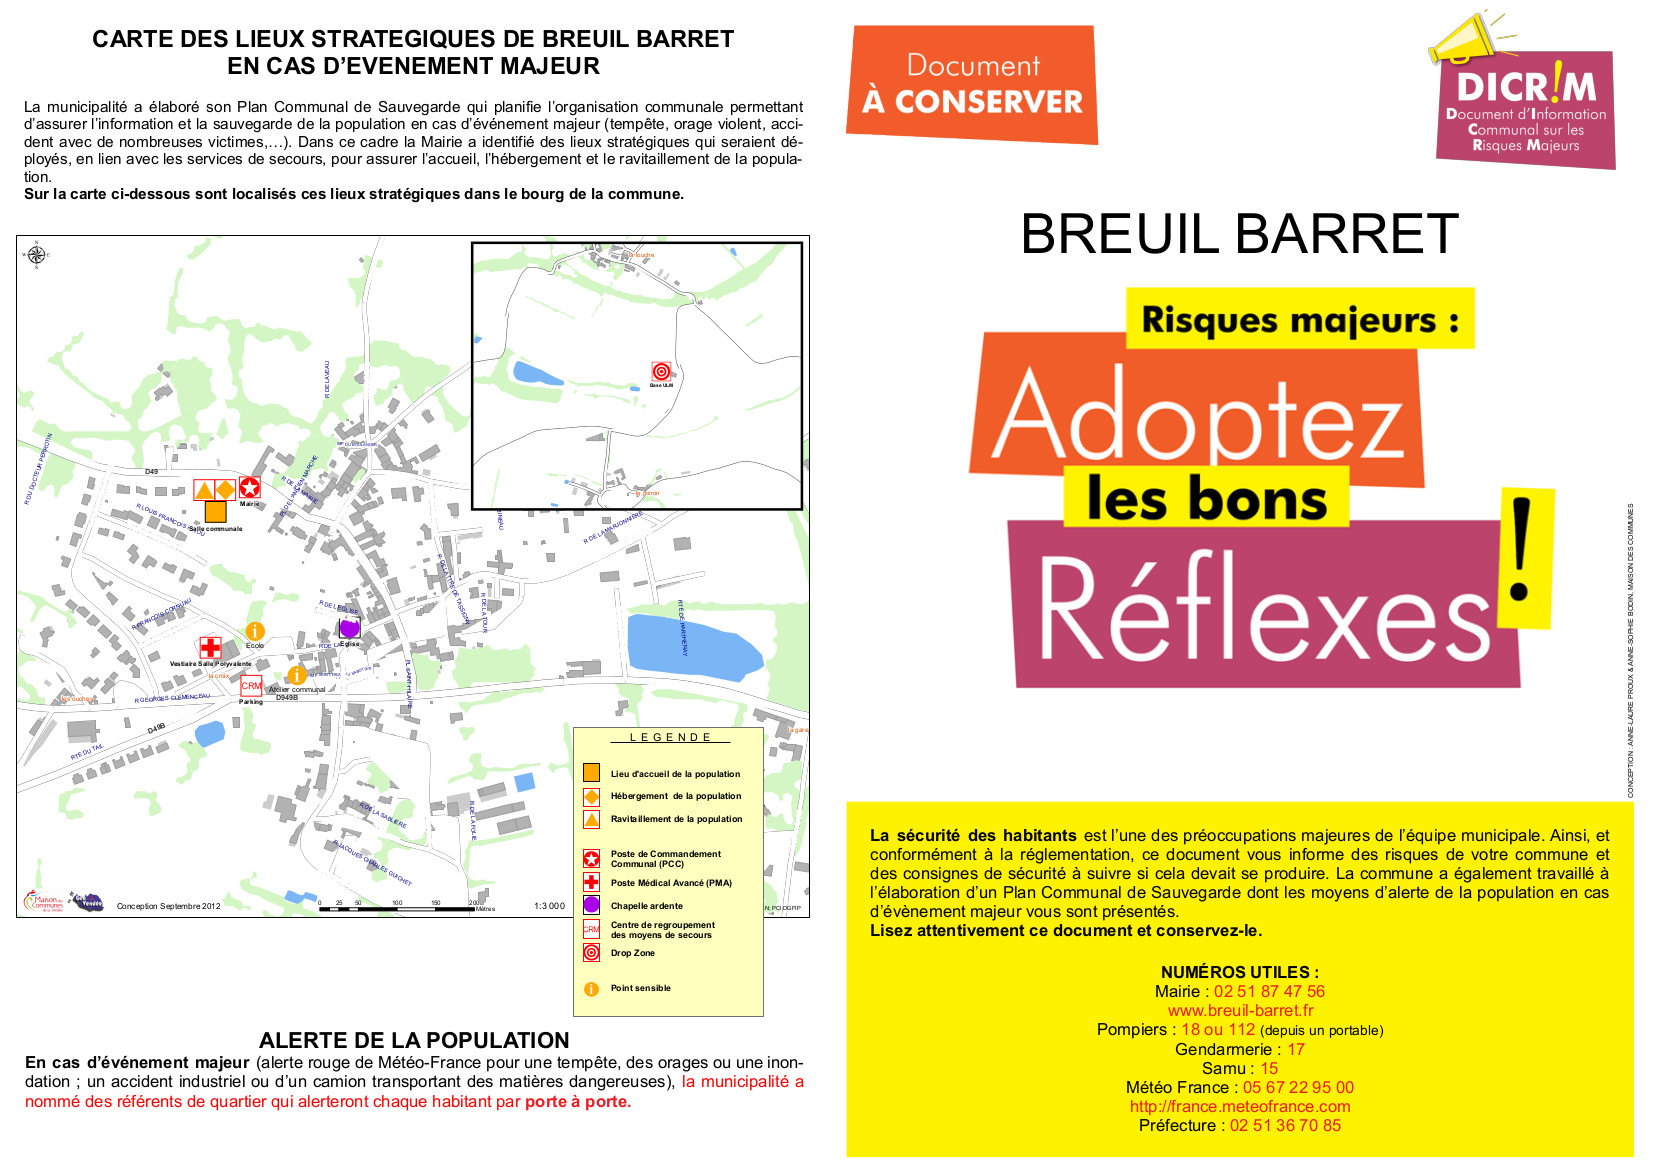 dicrim Breuil Barret page 1